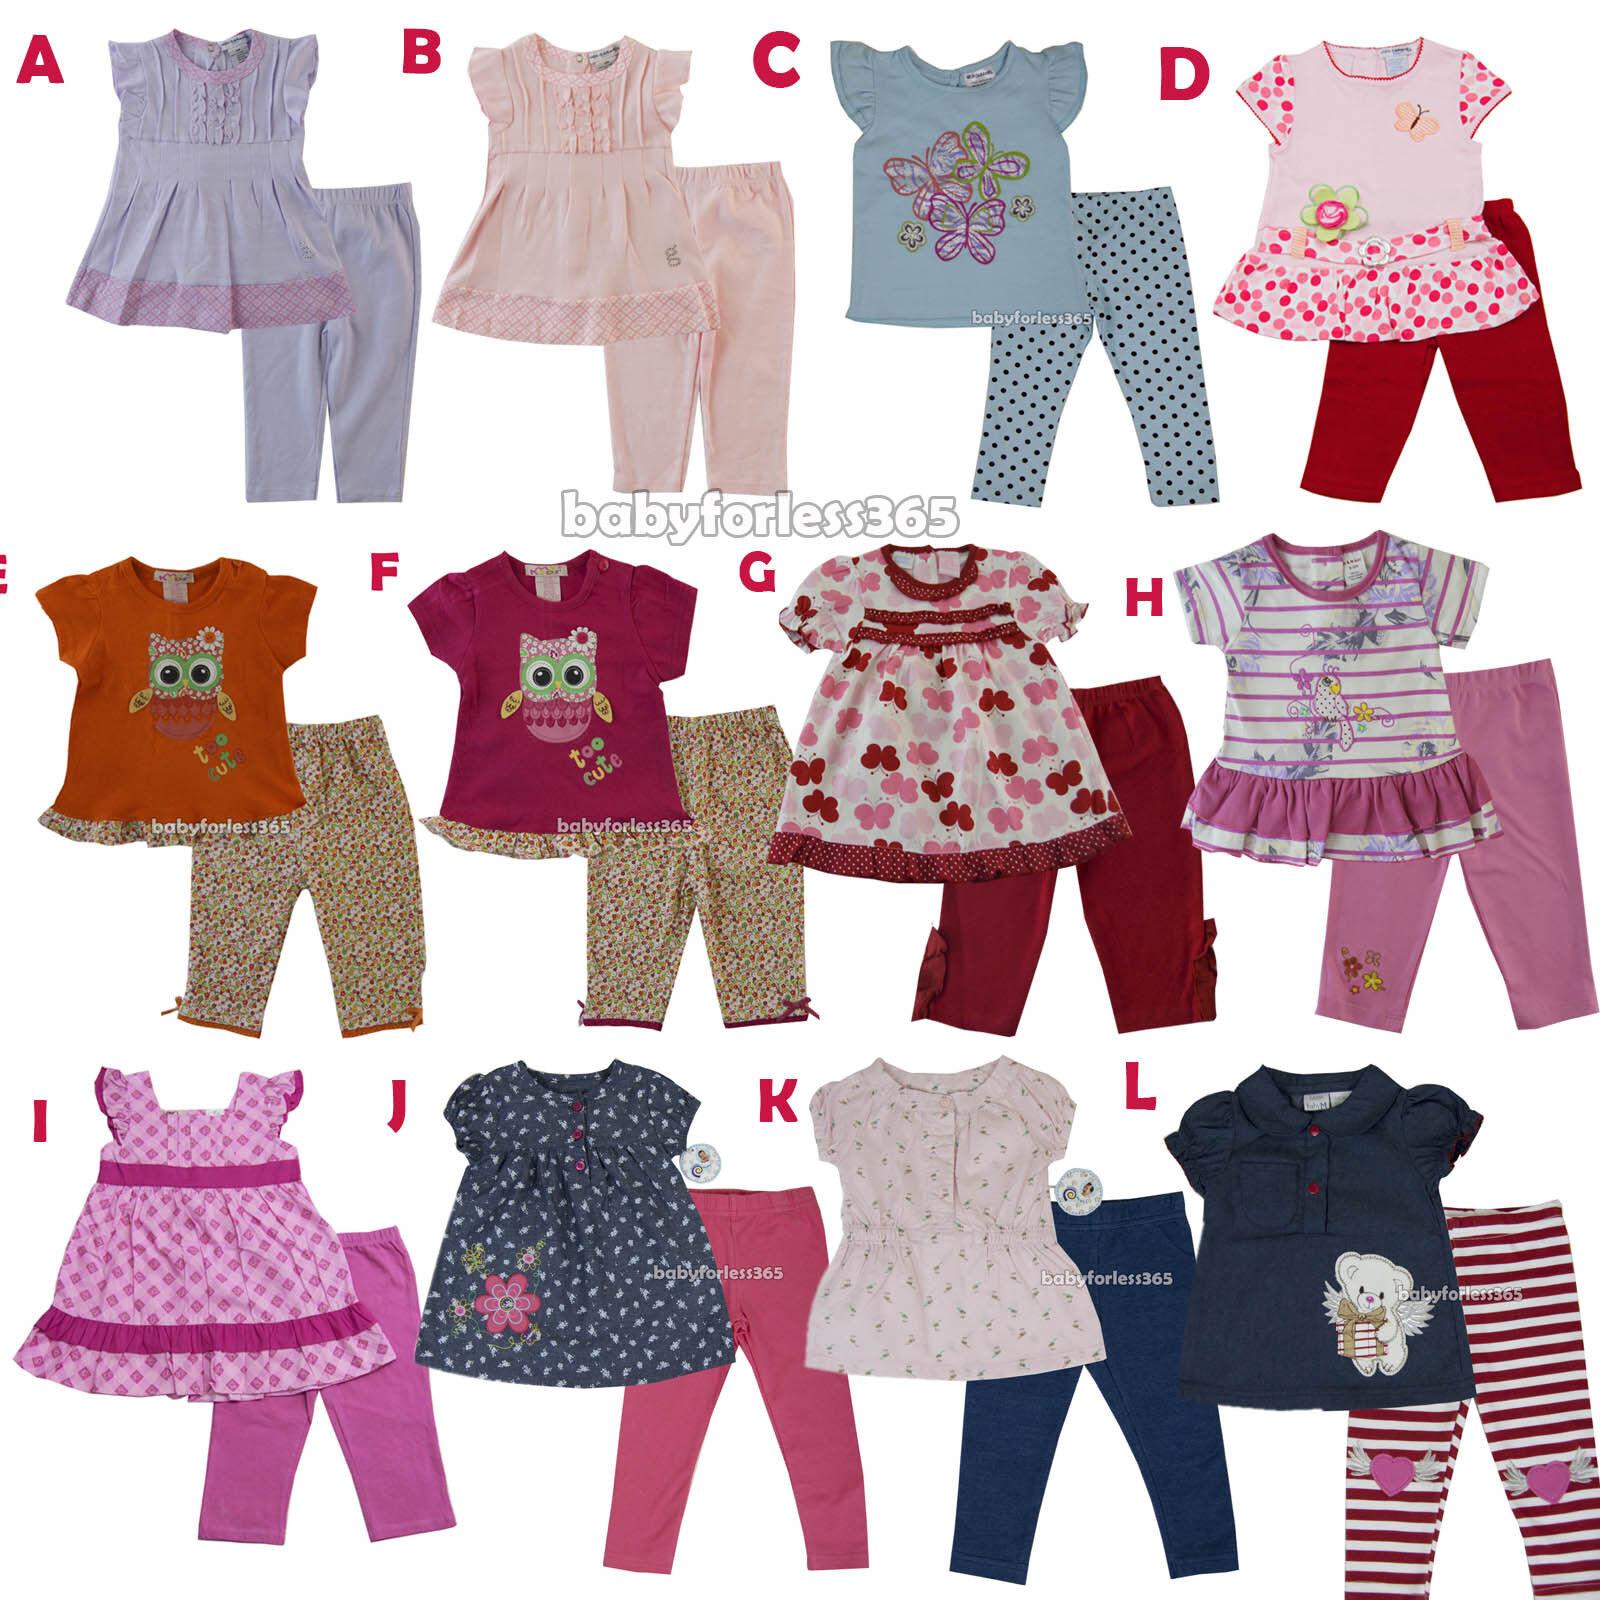 2PC Baby Boy Kids Toddler Long Sleeve Top+Pants Set Cotton Clothes 3-6-9-12-18M